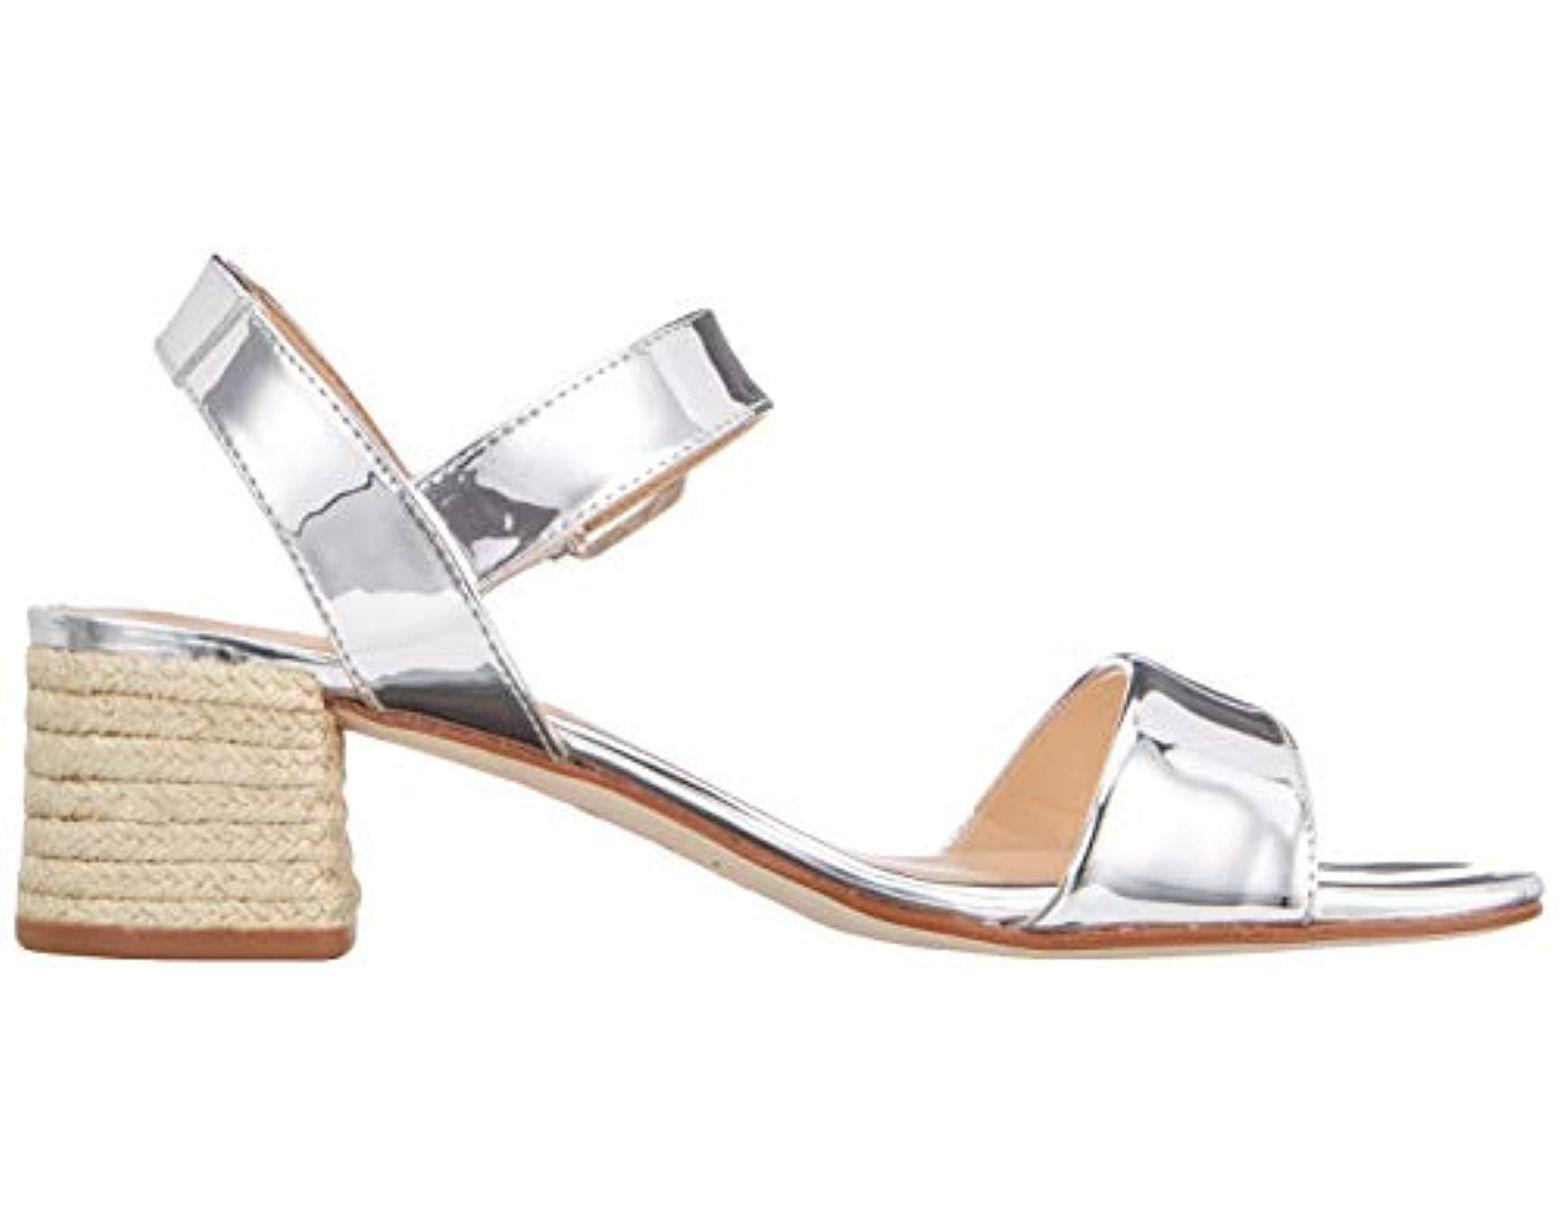 Sandals Lyst Unisa sp Ankle 's Kanela Strap Metallic In zqSUMpV